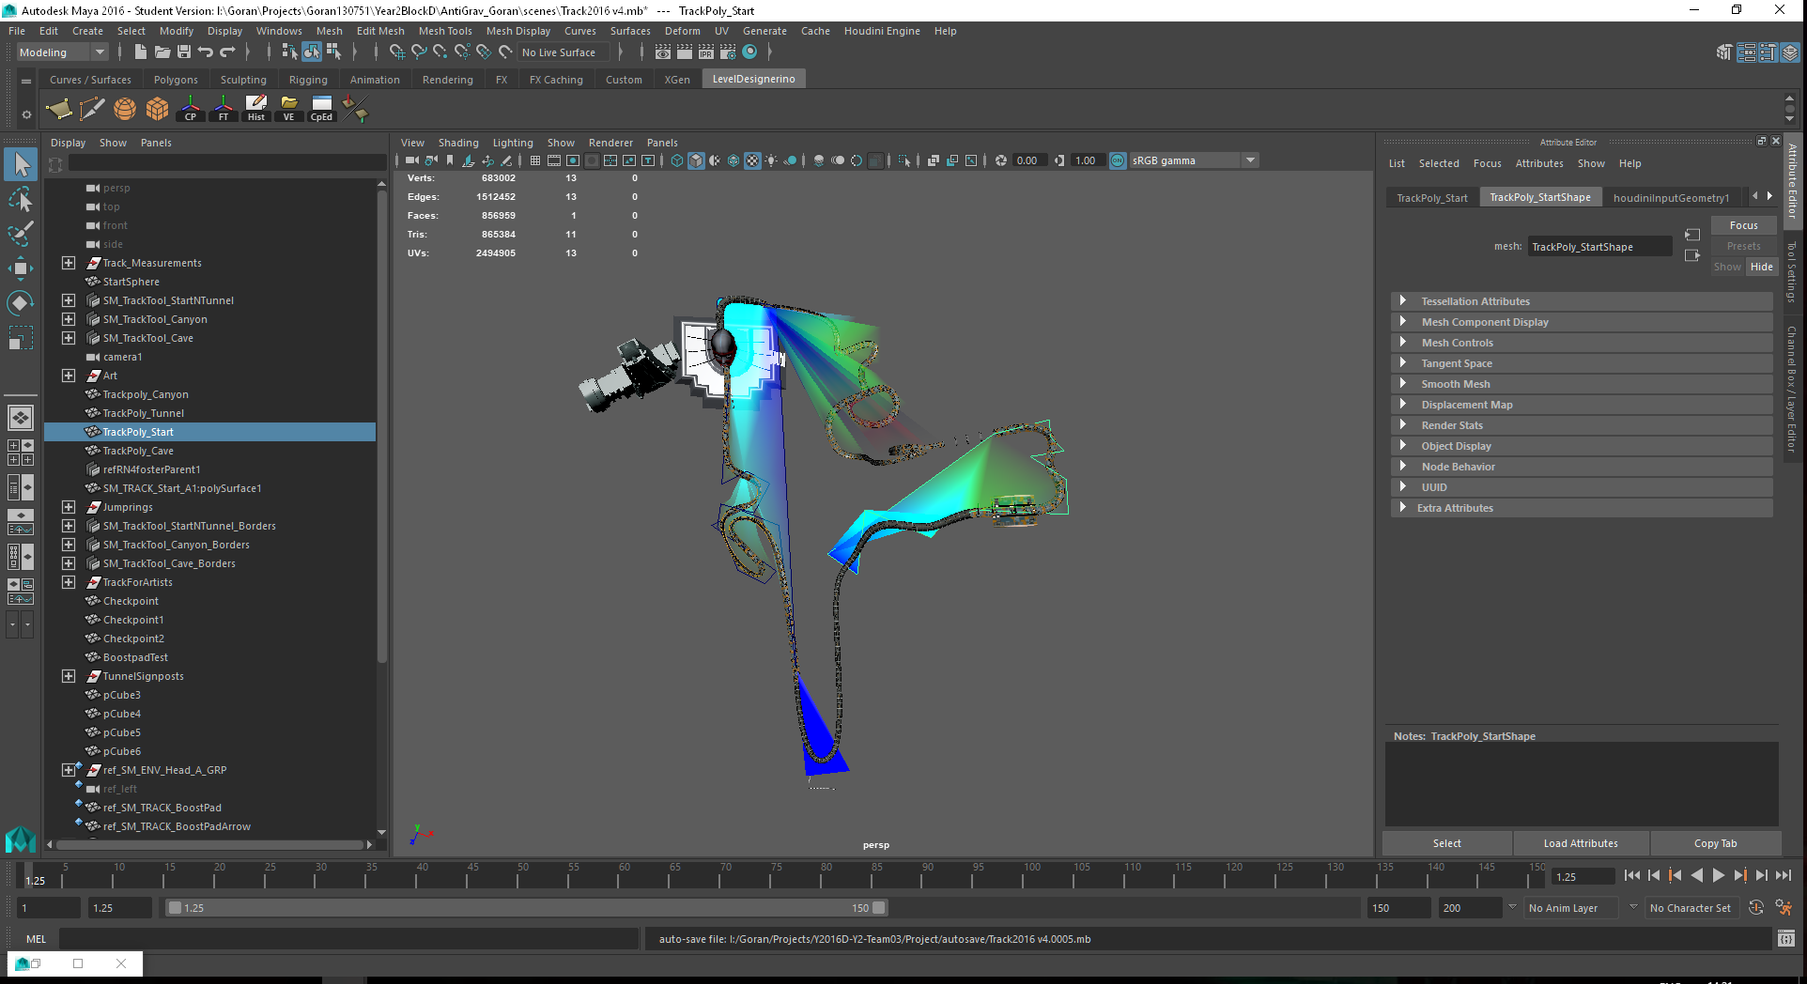 AGR - Level in Autodesk Maya